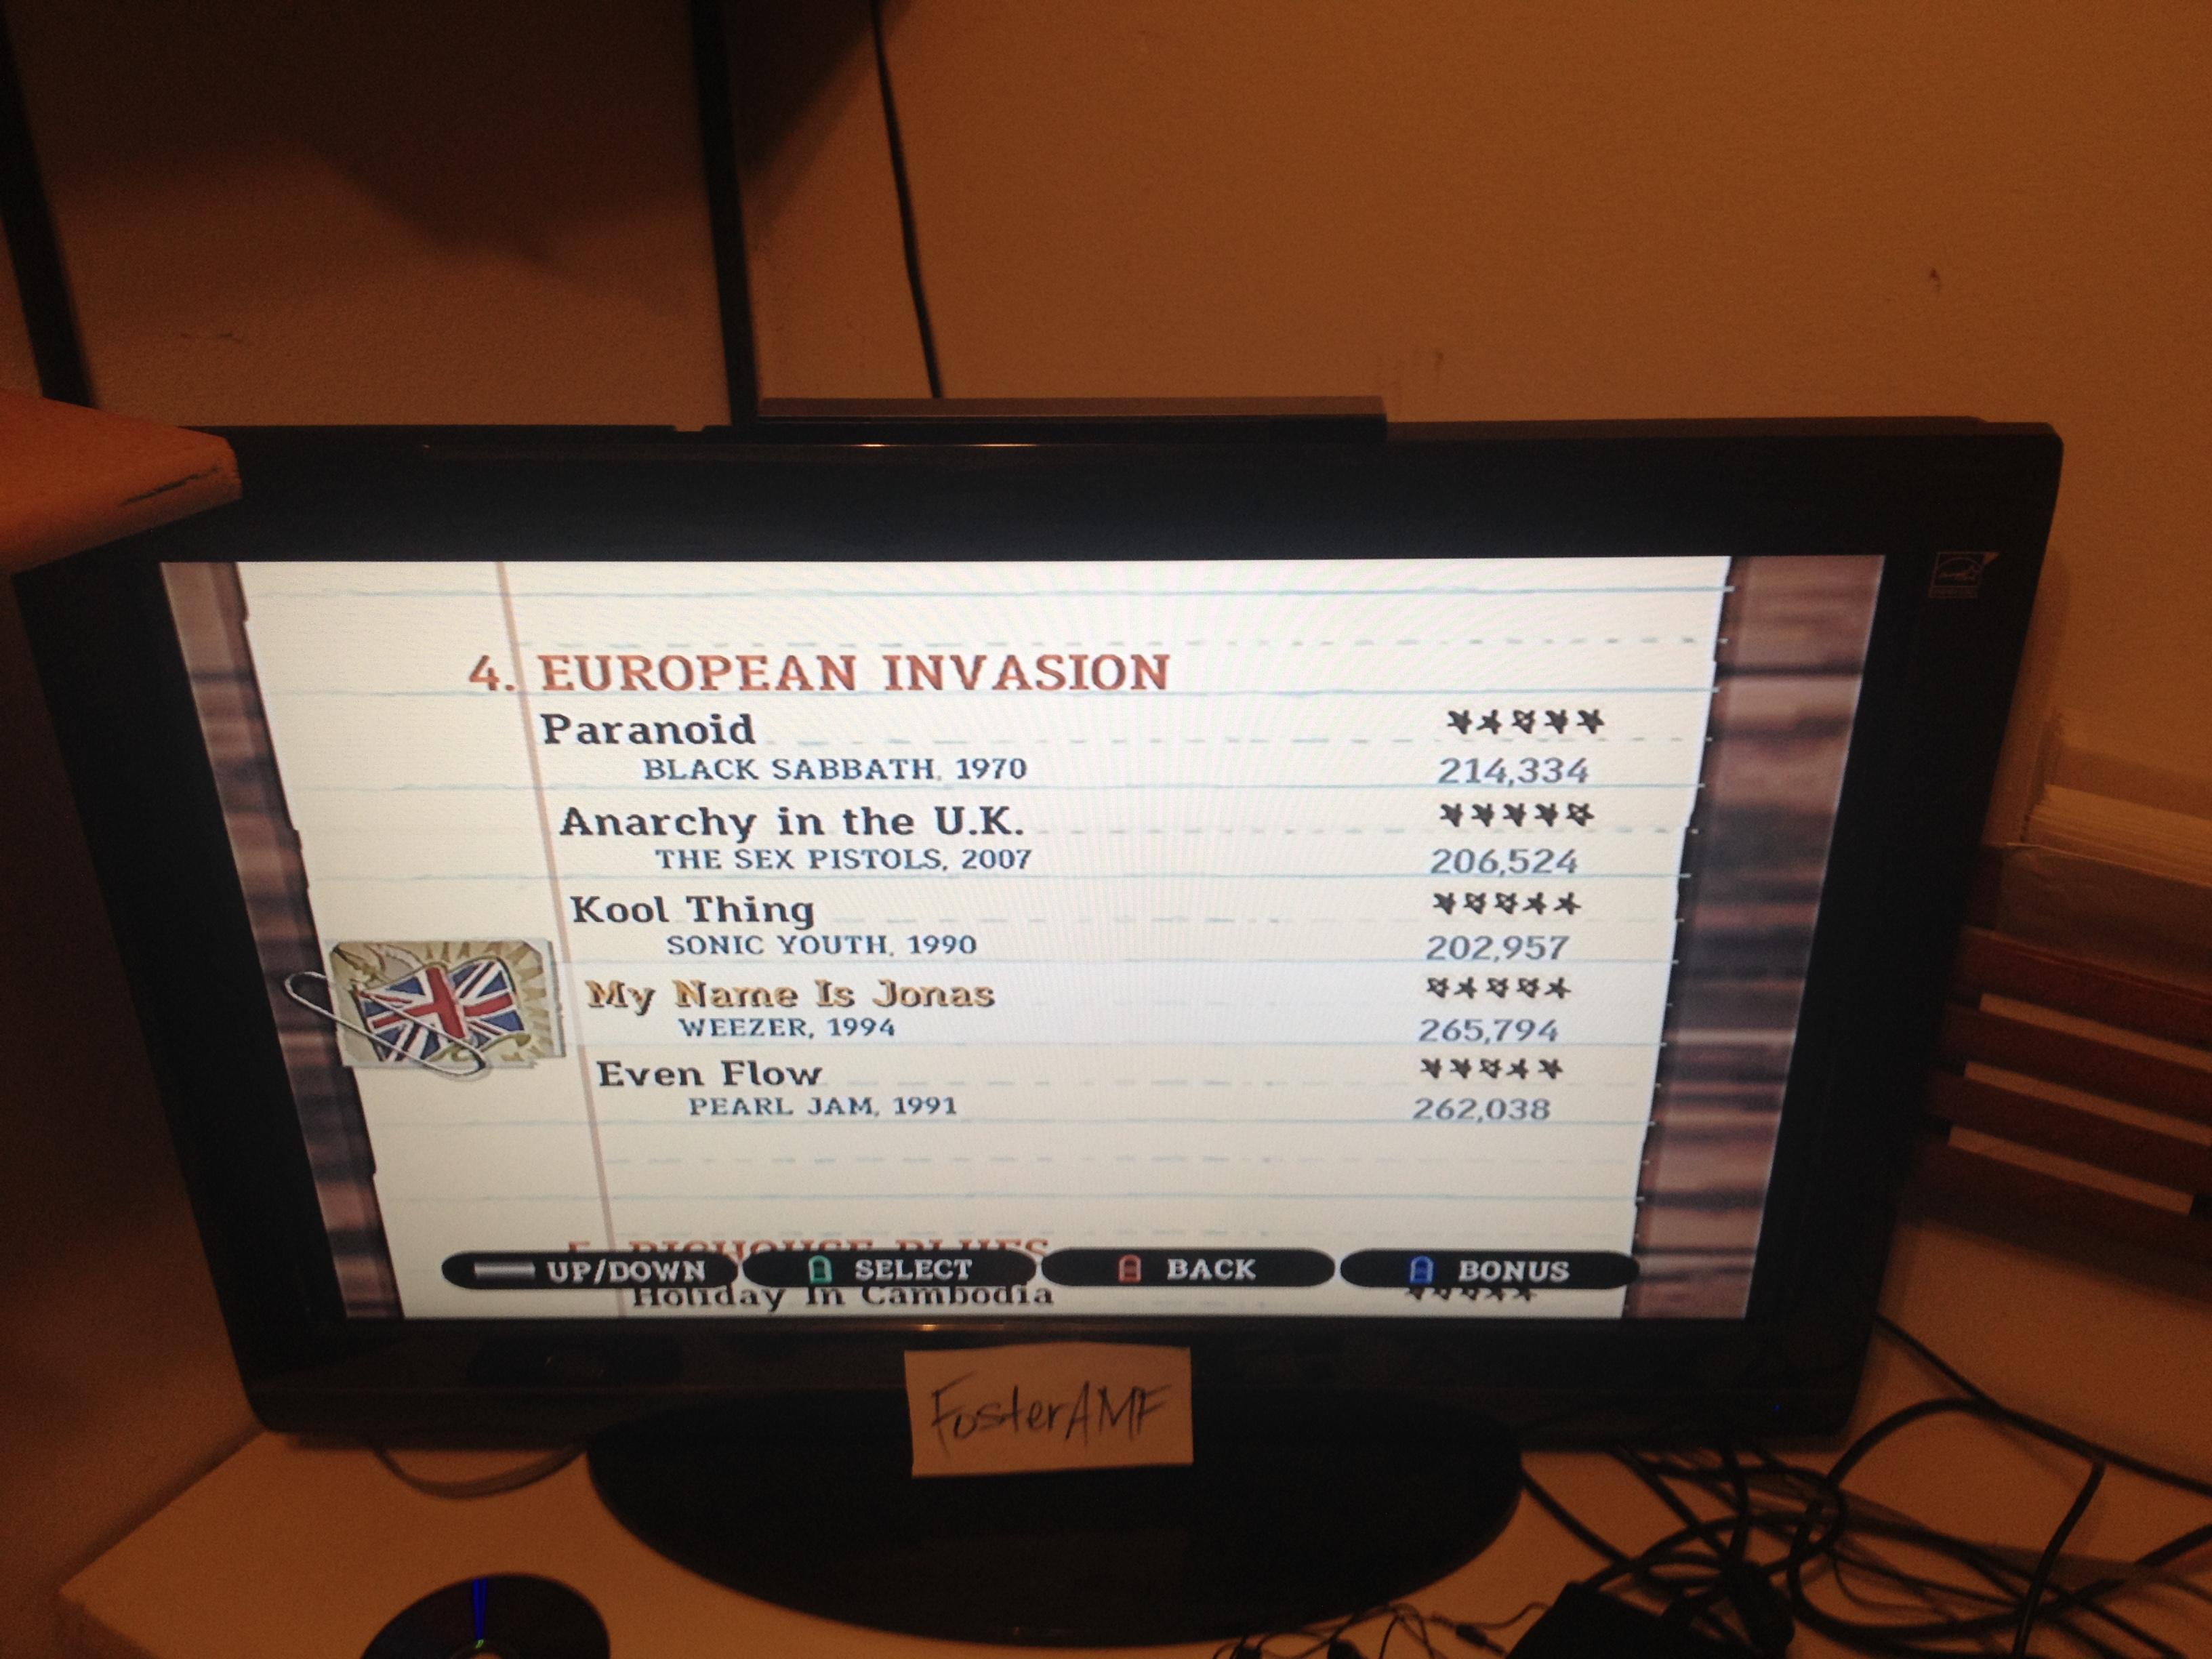 "FosterAMF: Guitar Hero III: Legends of Rock: ""Kool Thing"" [Expert] (Wii) 202,957 points on 2015-04-19 00:06:35"